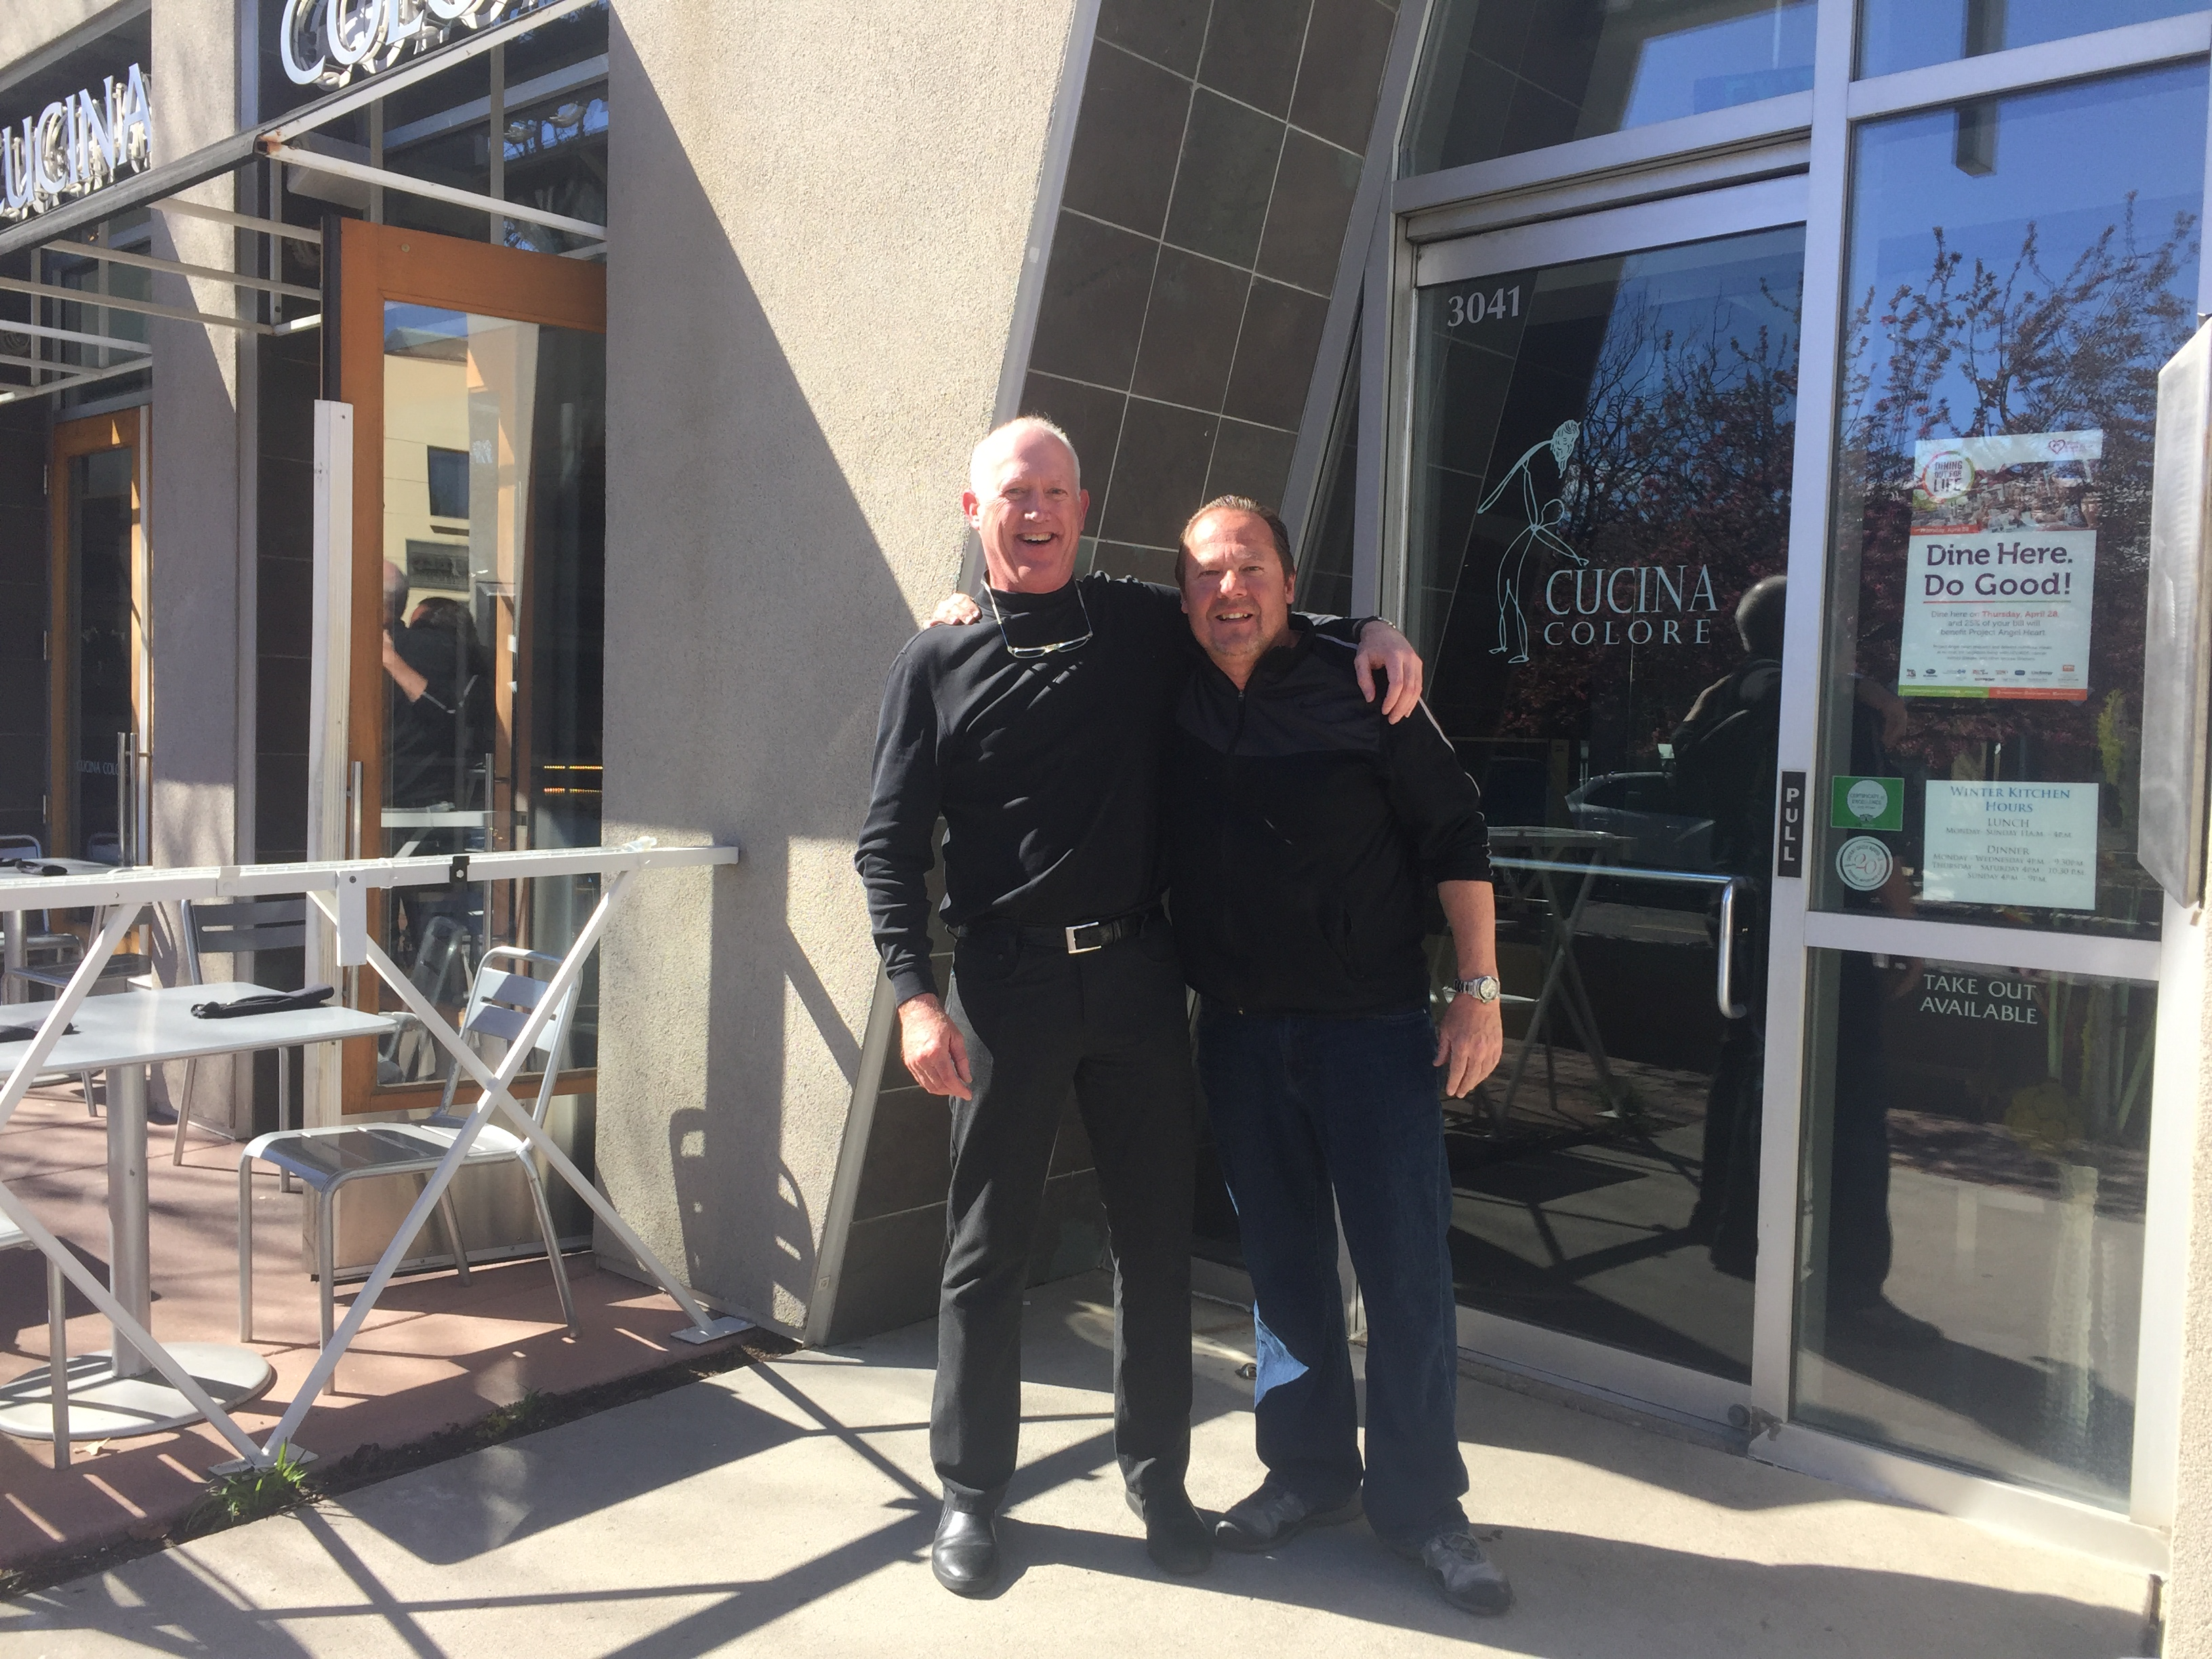 Jeff Sheppard and Venanzio Momo